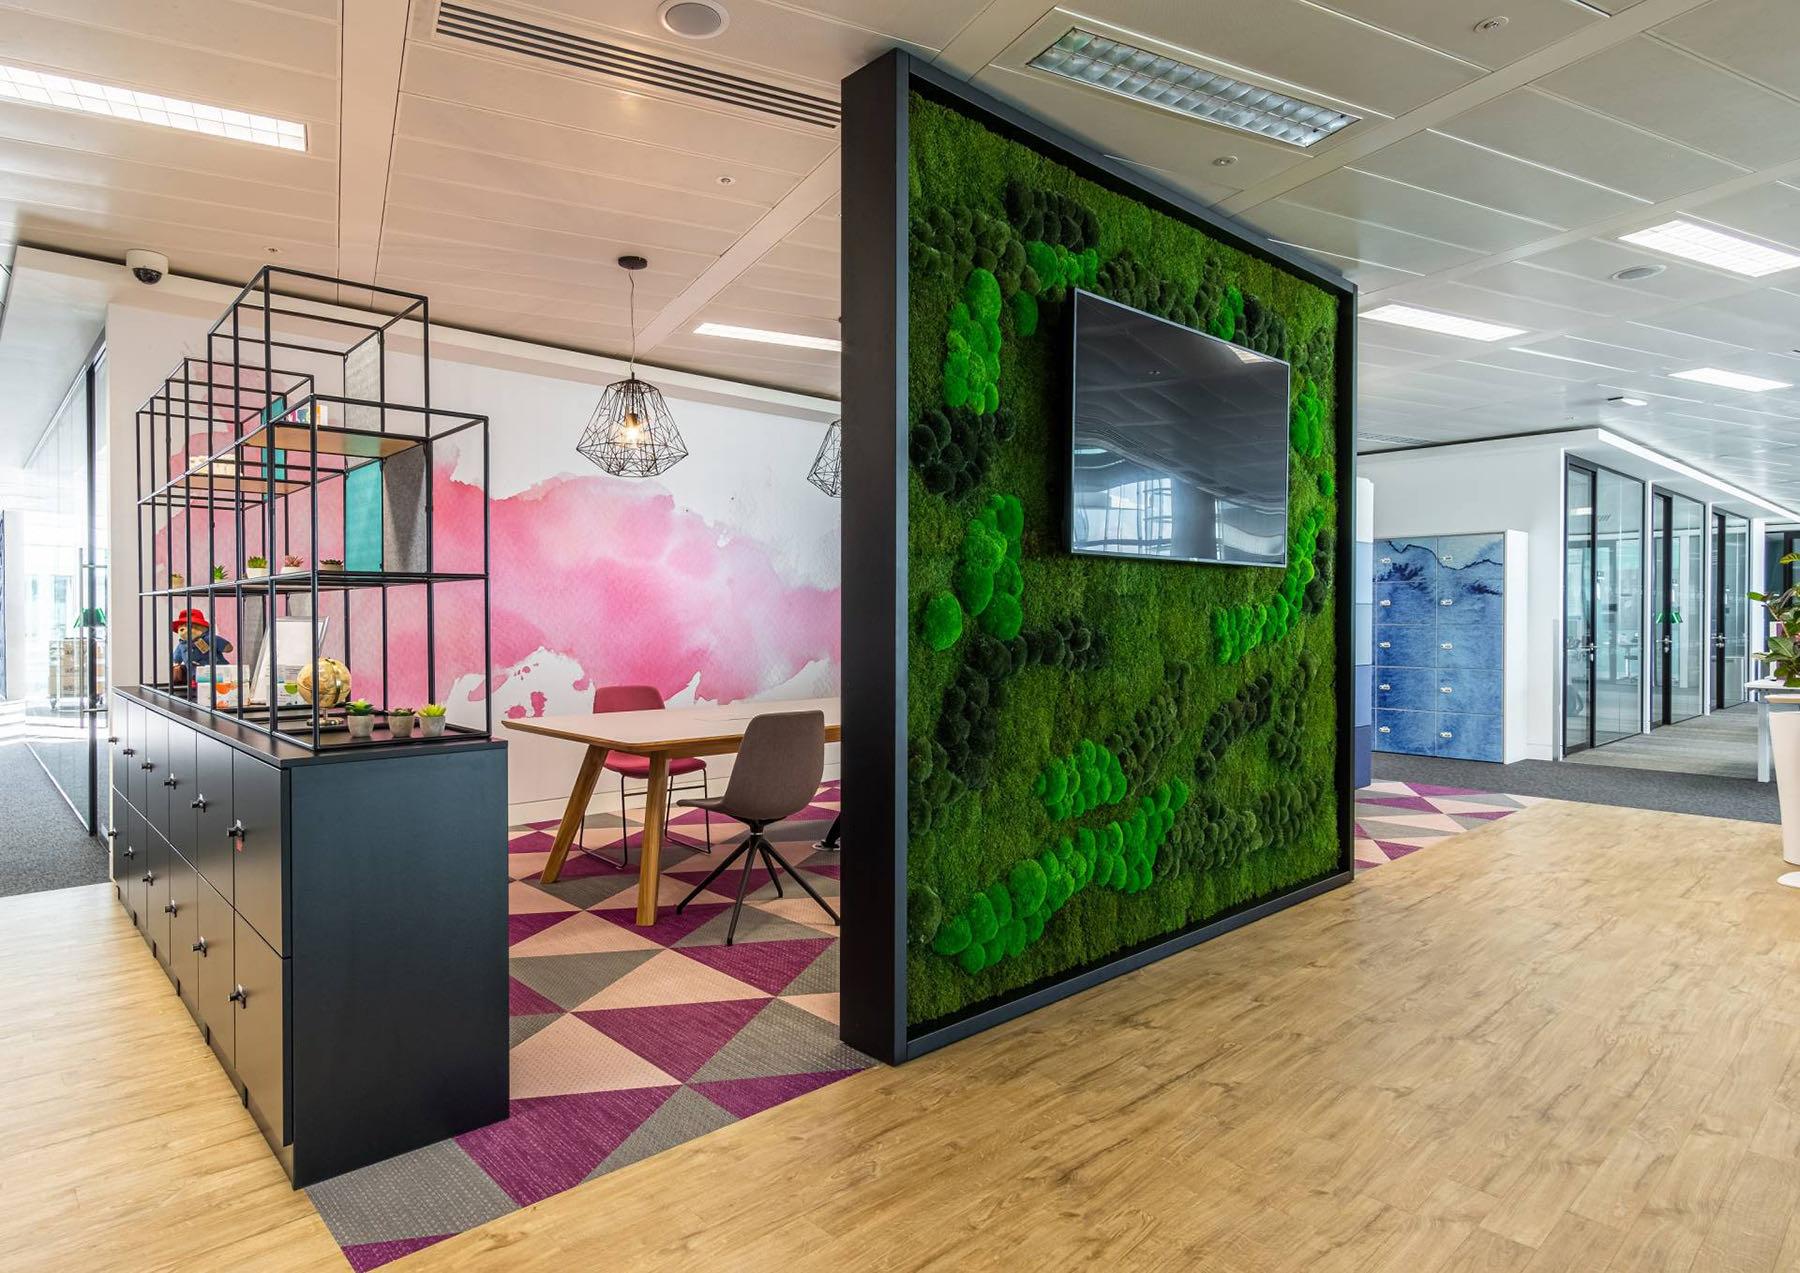 A Peek Inside Private Global Pharmaceutical Company's London Office